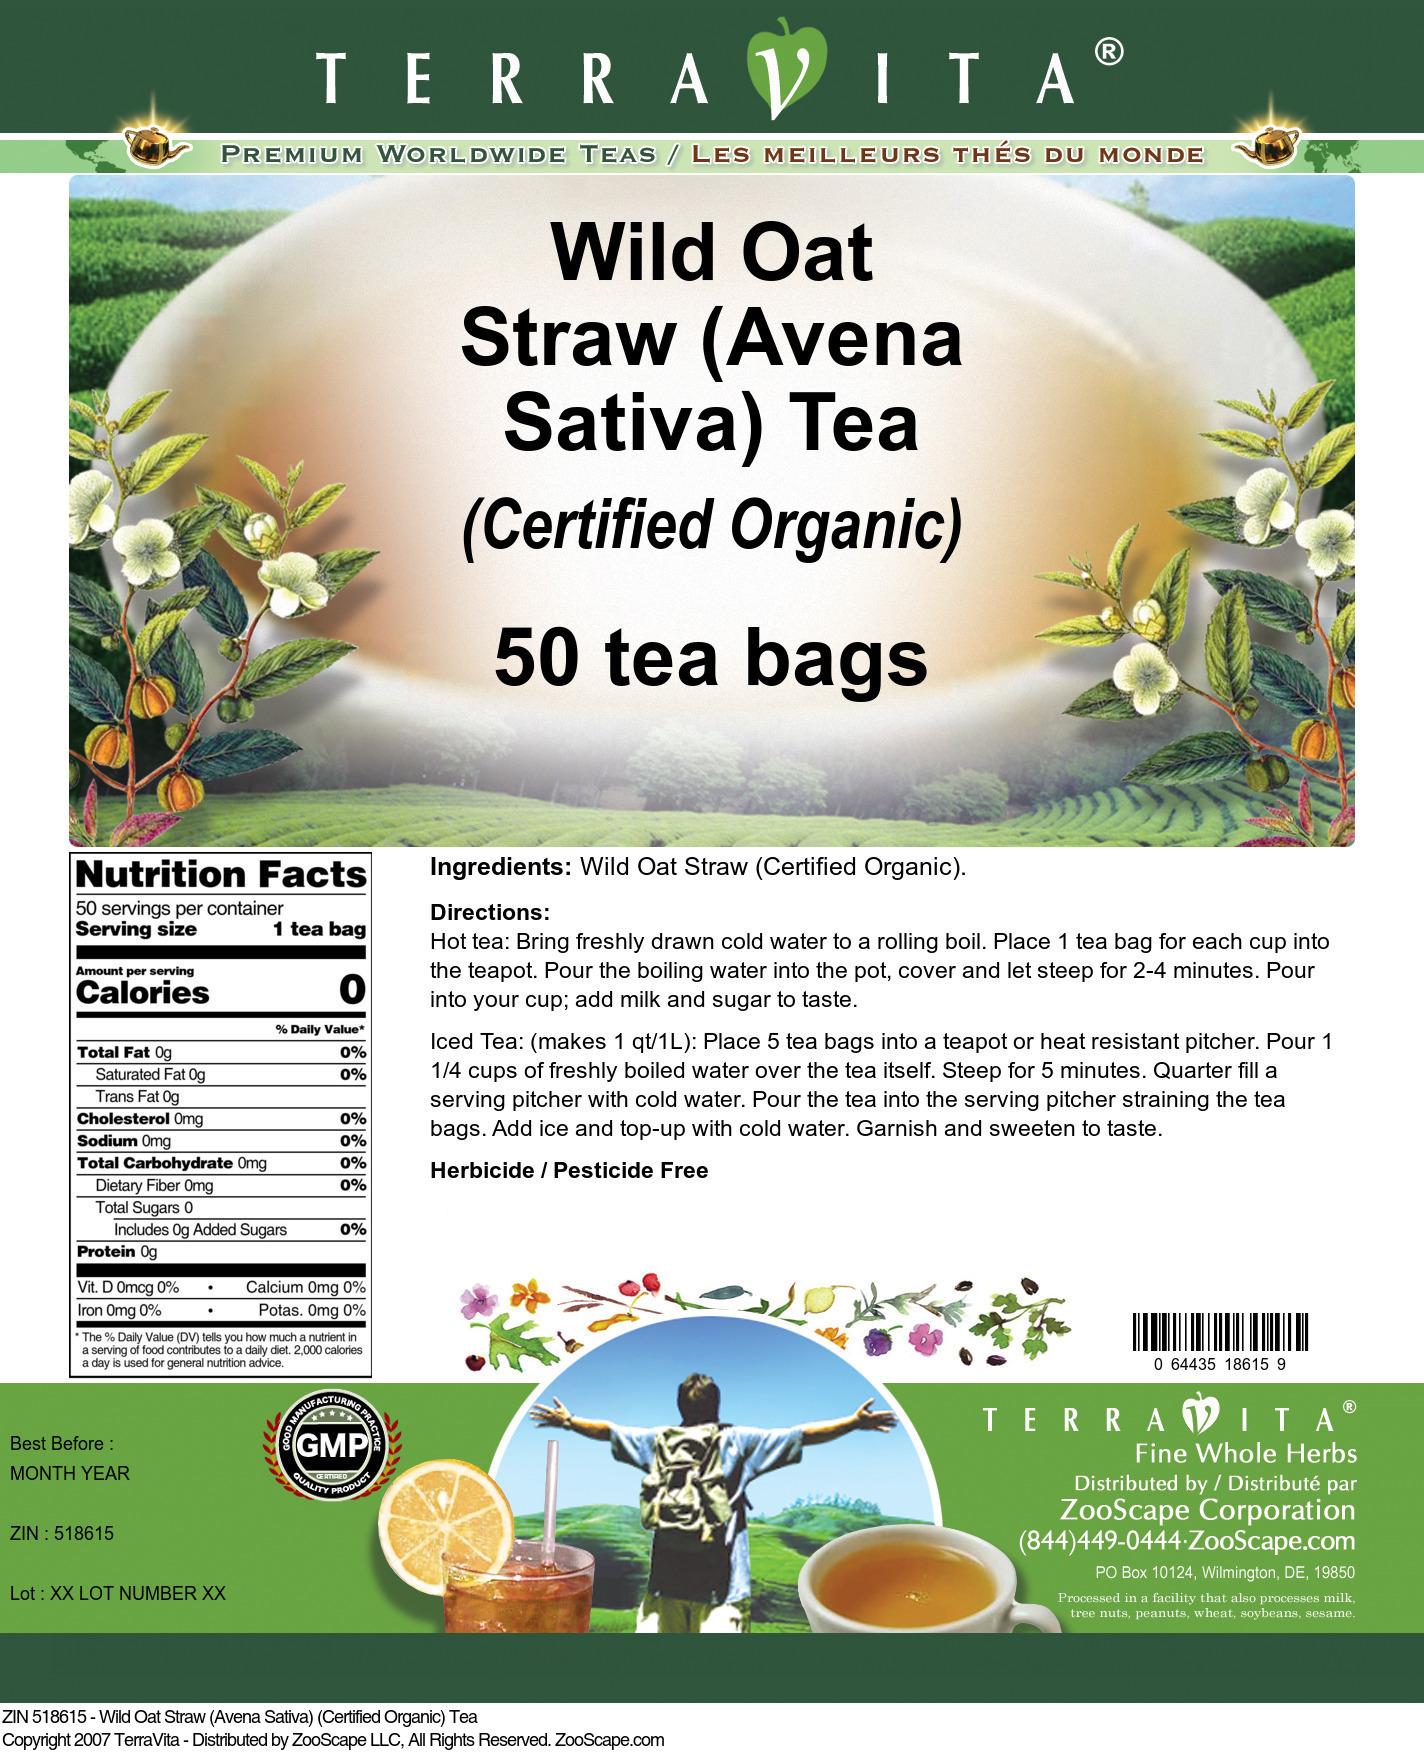 Wild Oat Straw (Avena Sativa) (Certified Organic) Tea